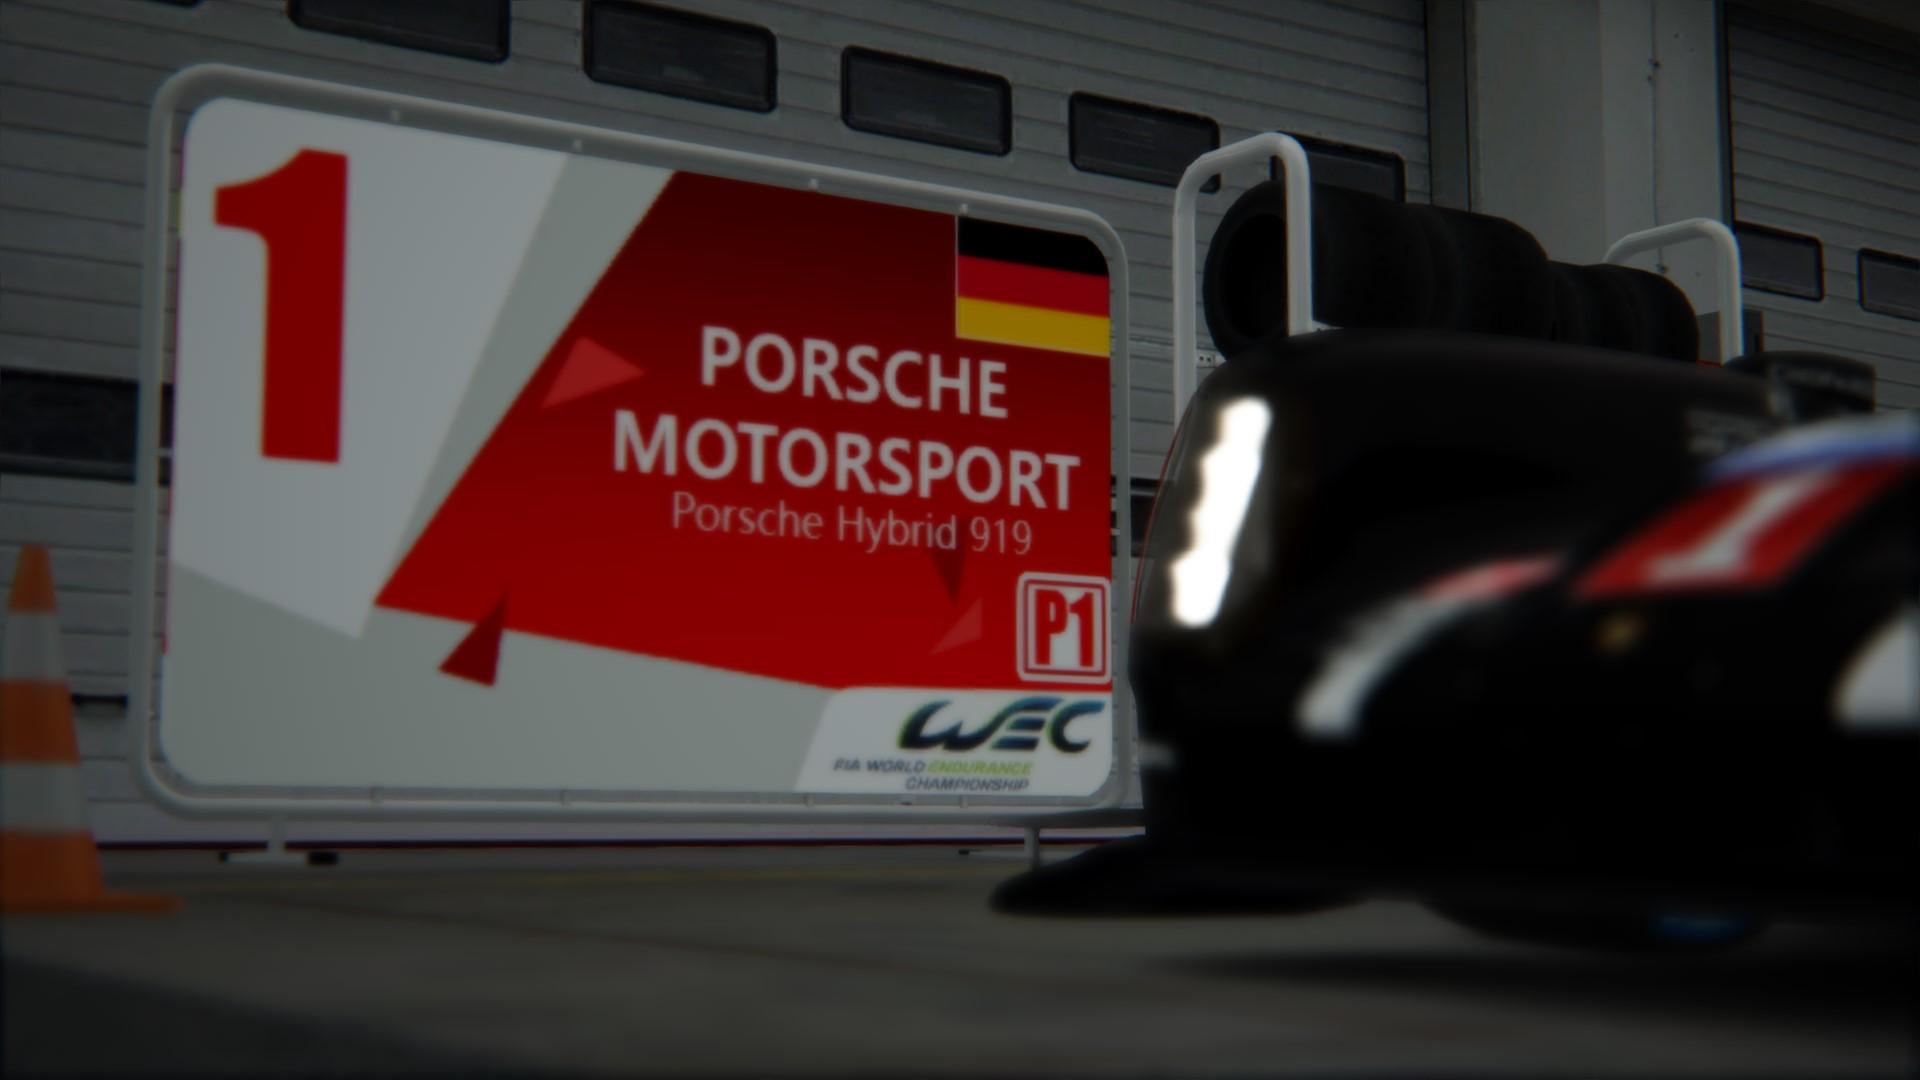 Screenshot_ks_porsche_919_hybrid_2016_ks_nurburgring_22-1-117-21-40-35.jpg